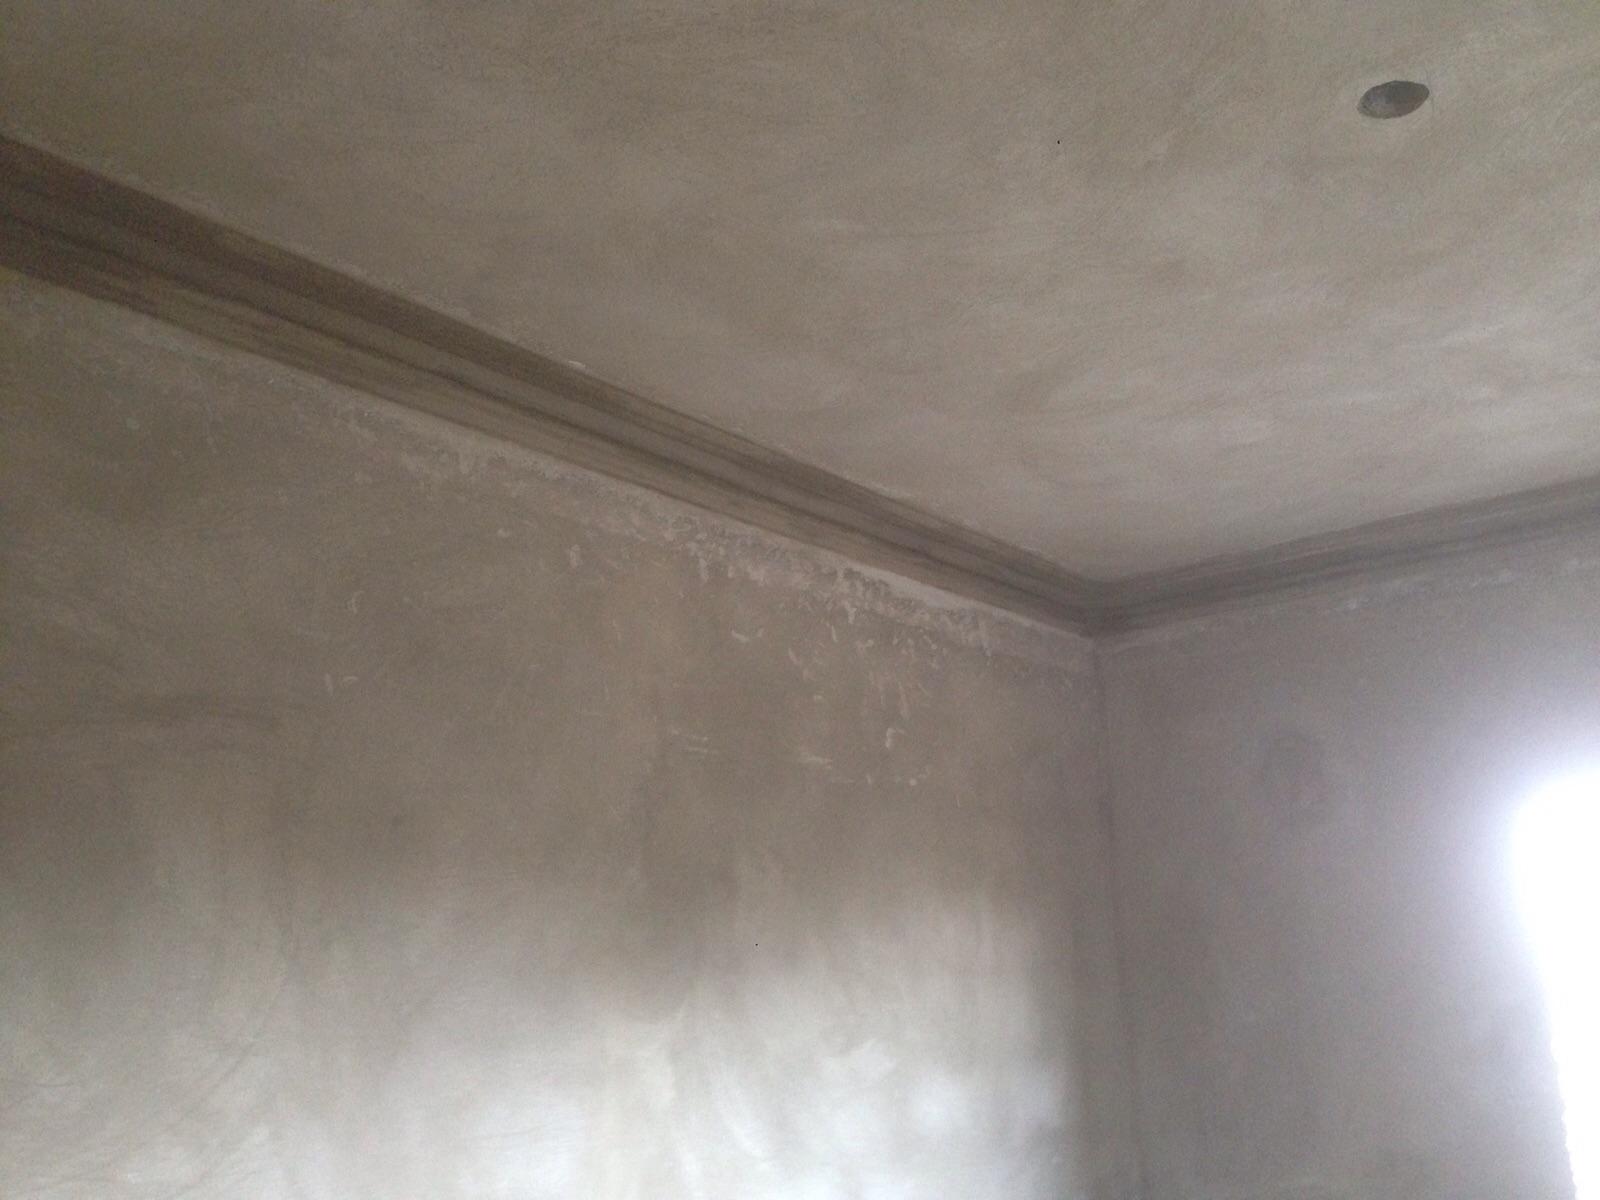 Guesthouse, First Floor trim work